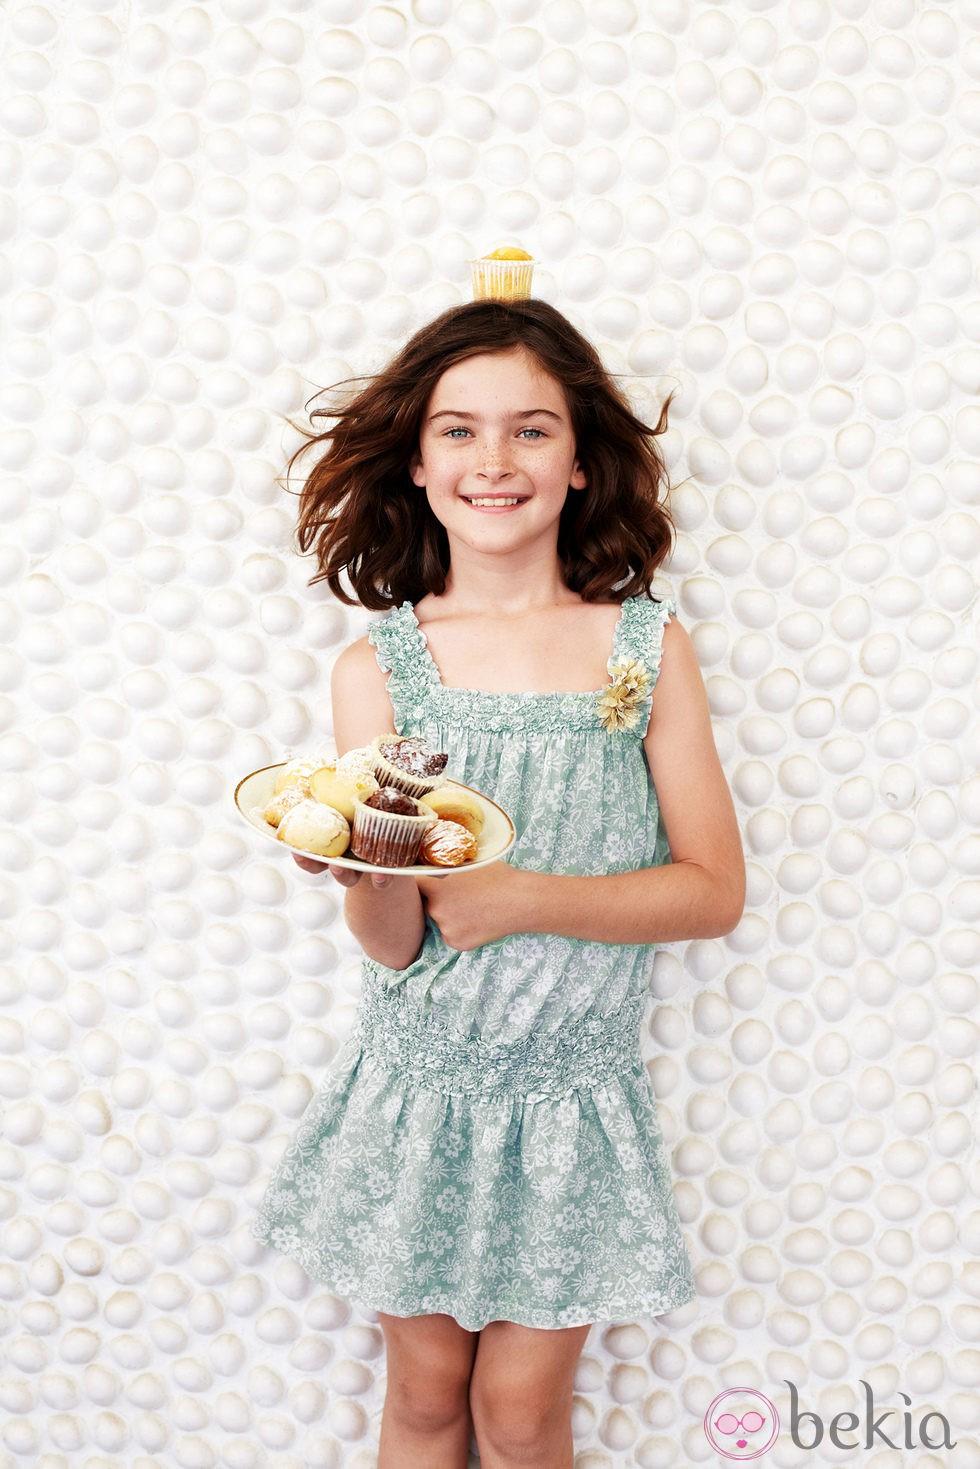 Anterior Vestido de tirantes para niña de la colección primavera verano  2013 de Benetton 1c5d0f0b76a